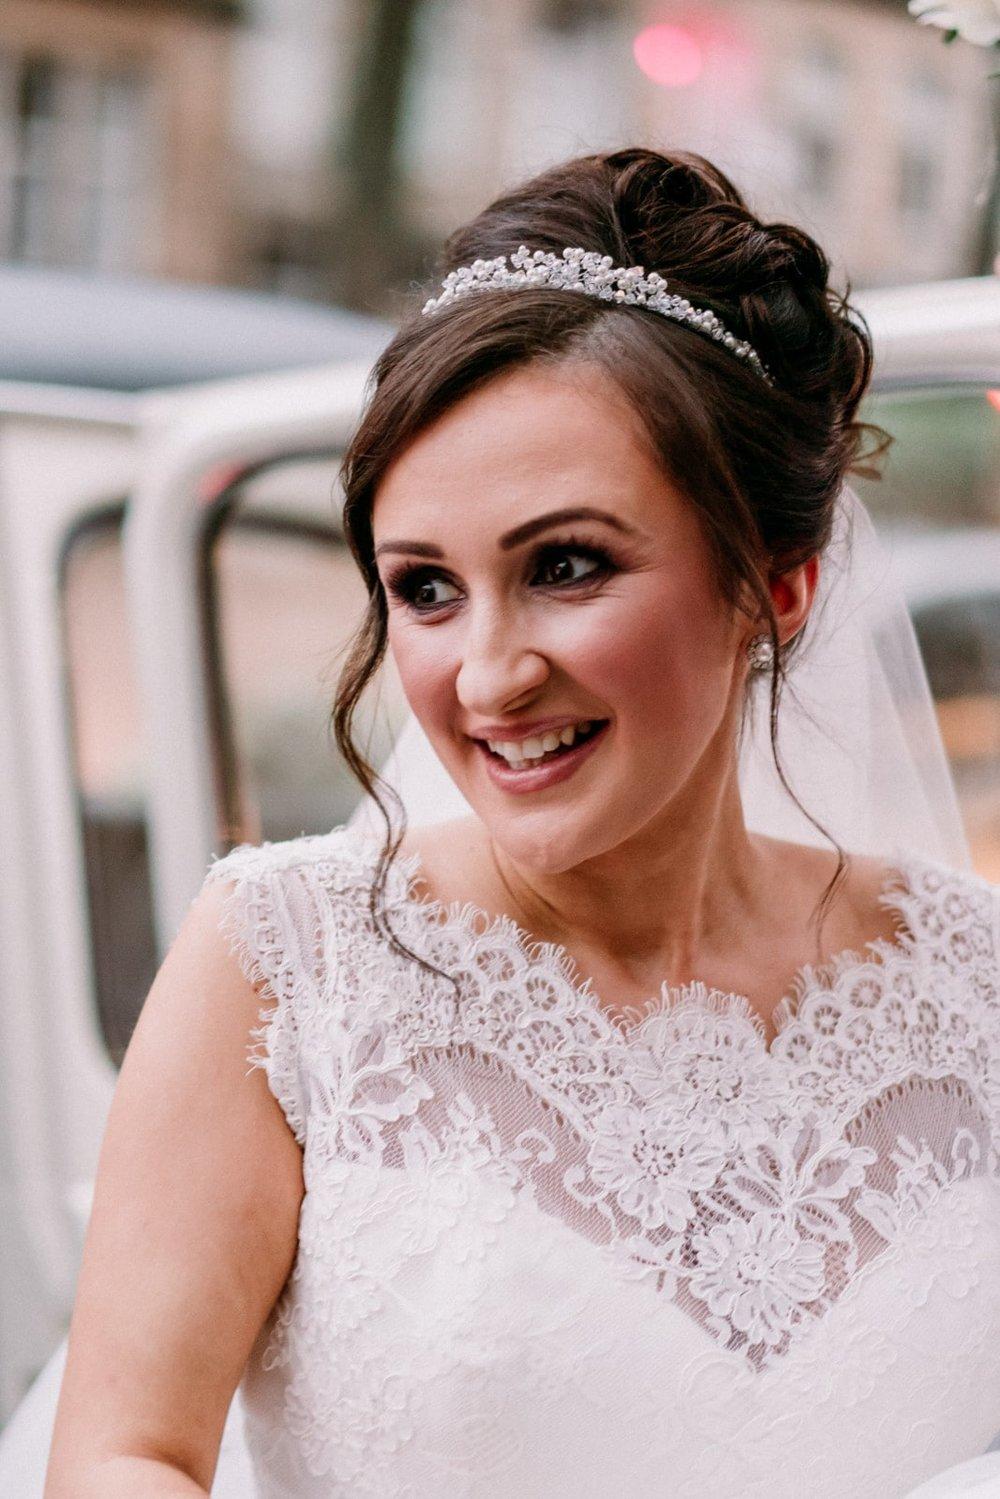 Oran-Mor-Wedding-Photographer-DearlyPhotography (11 of 55).jpg